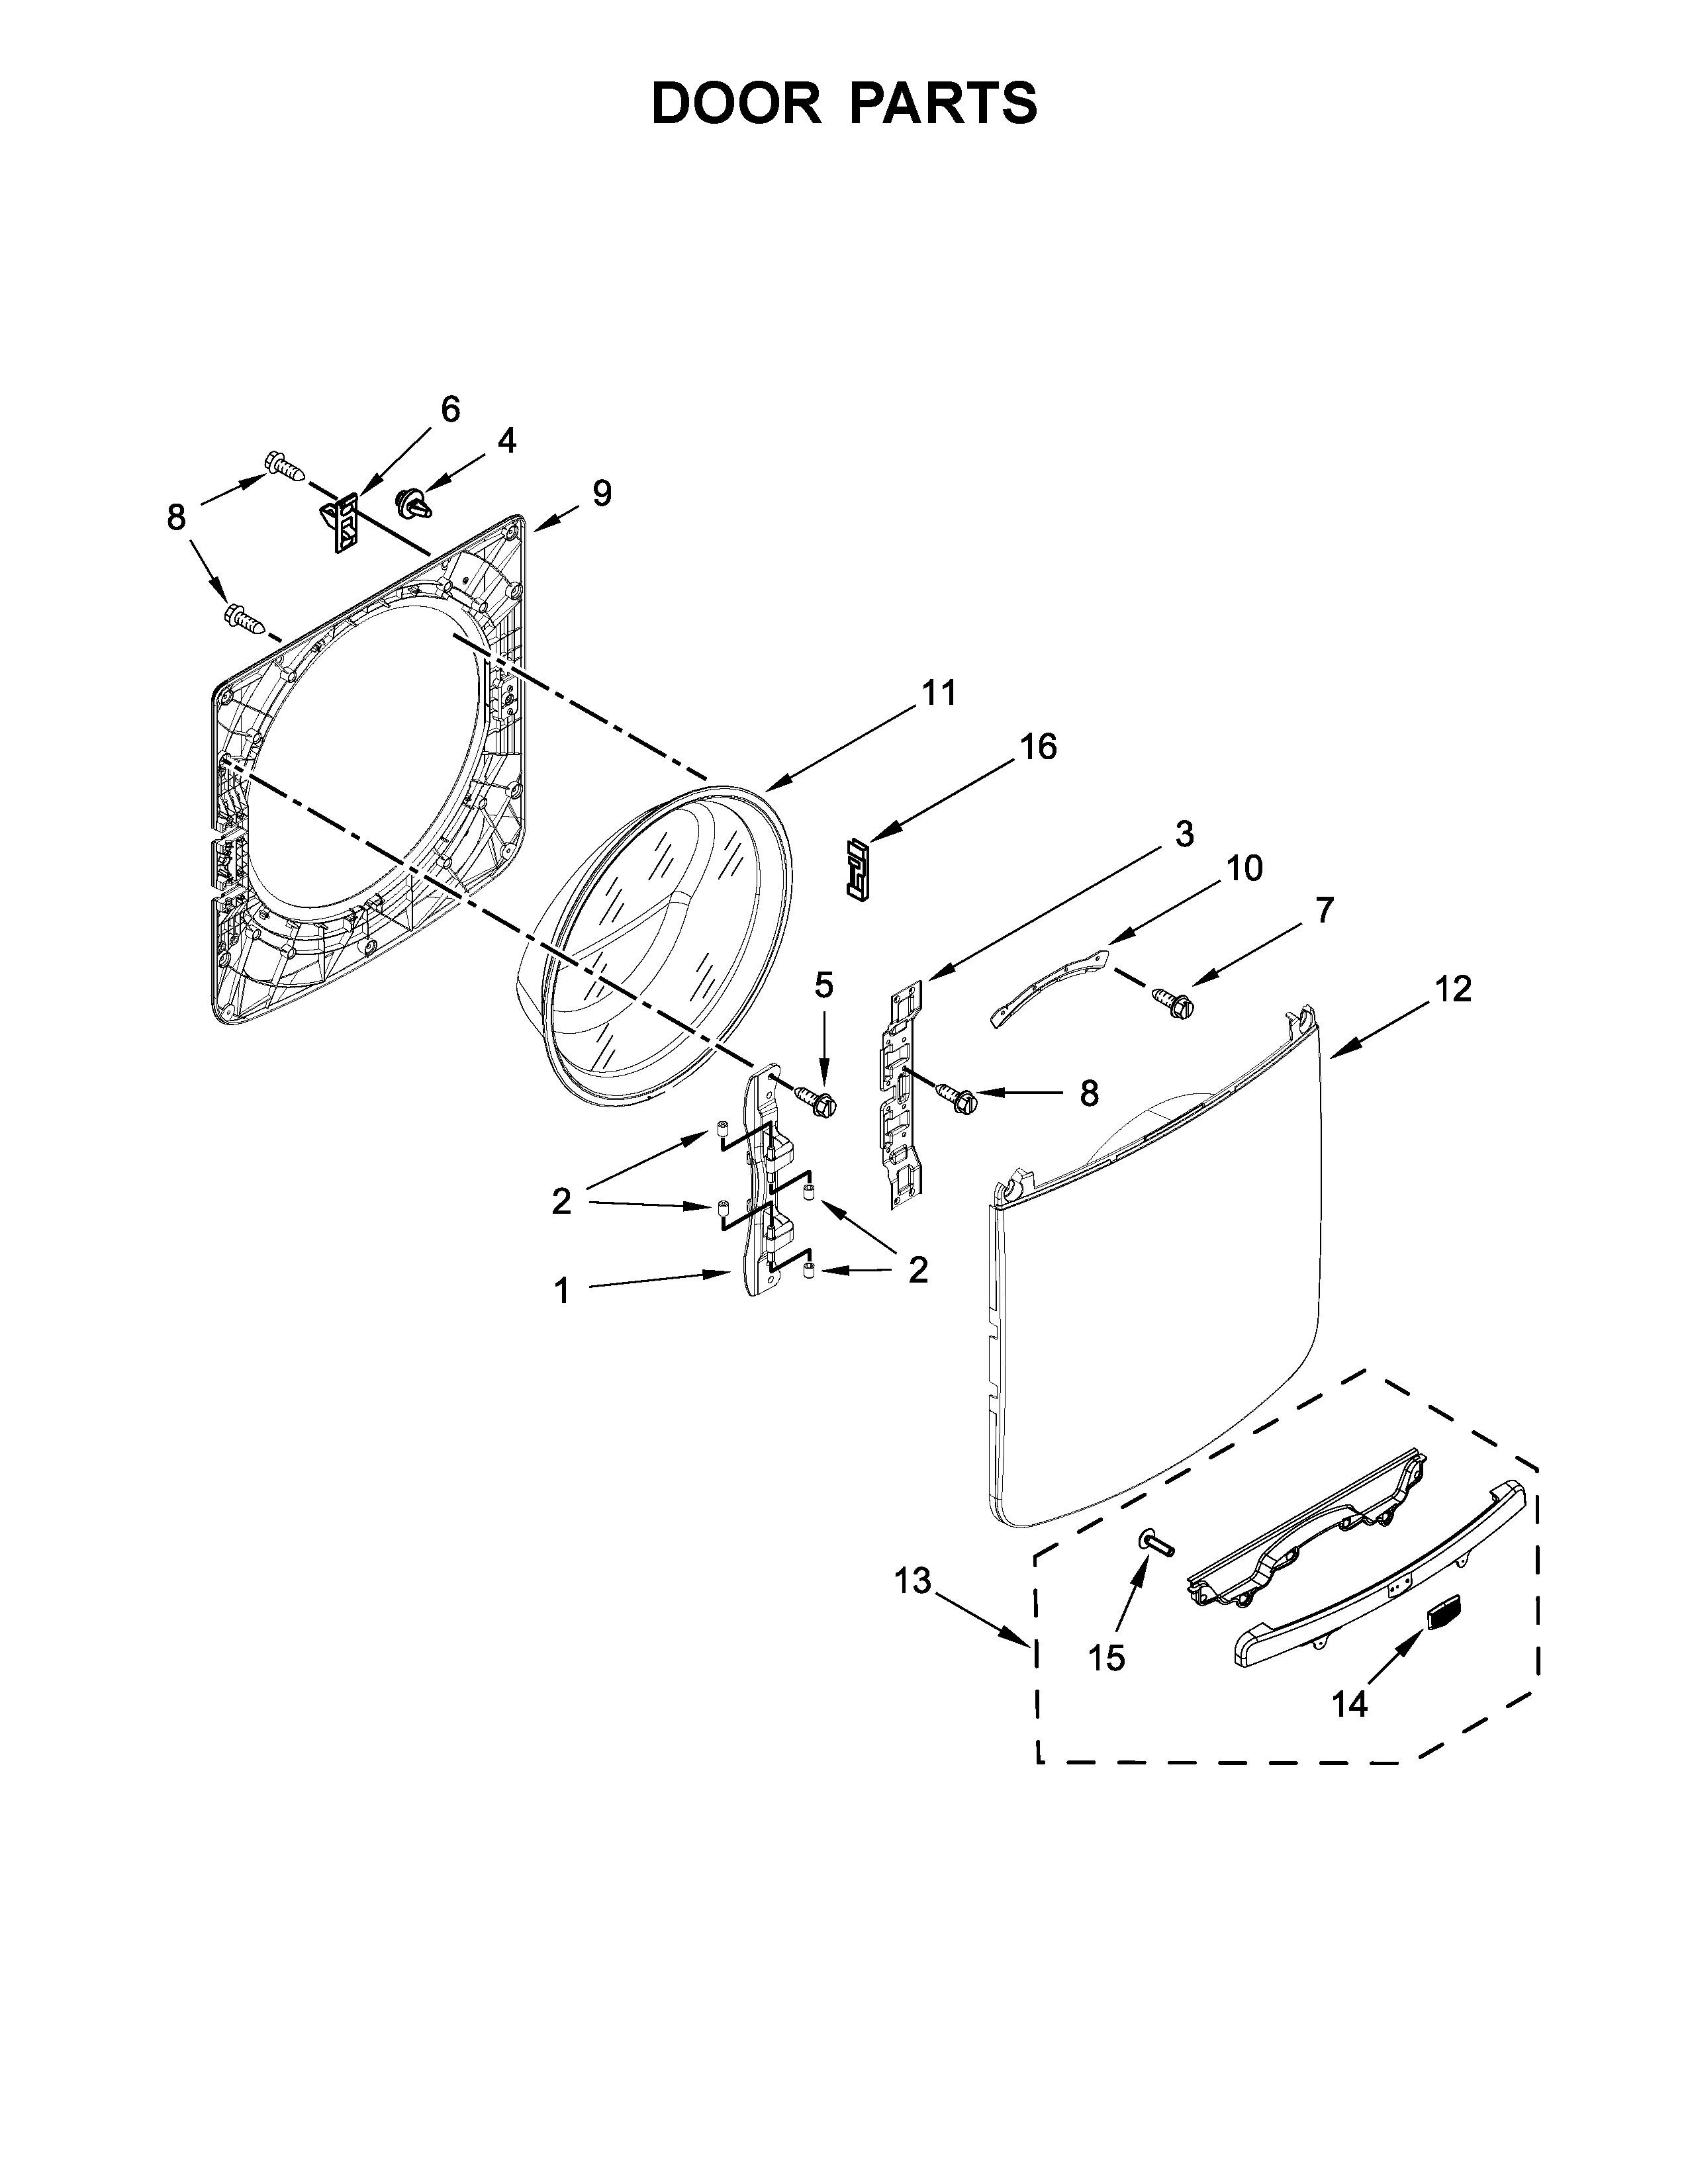 Bosch Dryer Parts Diagram Maytag Model Mhw3505fw1 Residential Washers Genuine Parts Of Bosch Dryer Parts Diagram